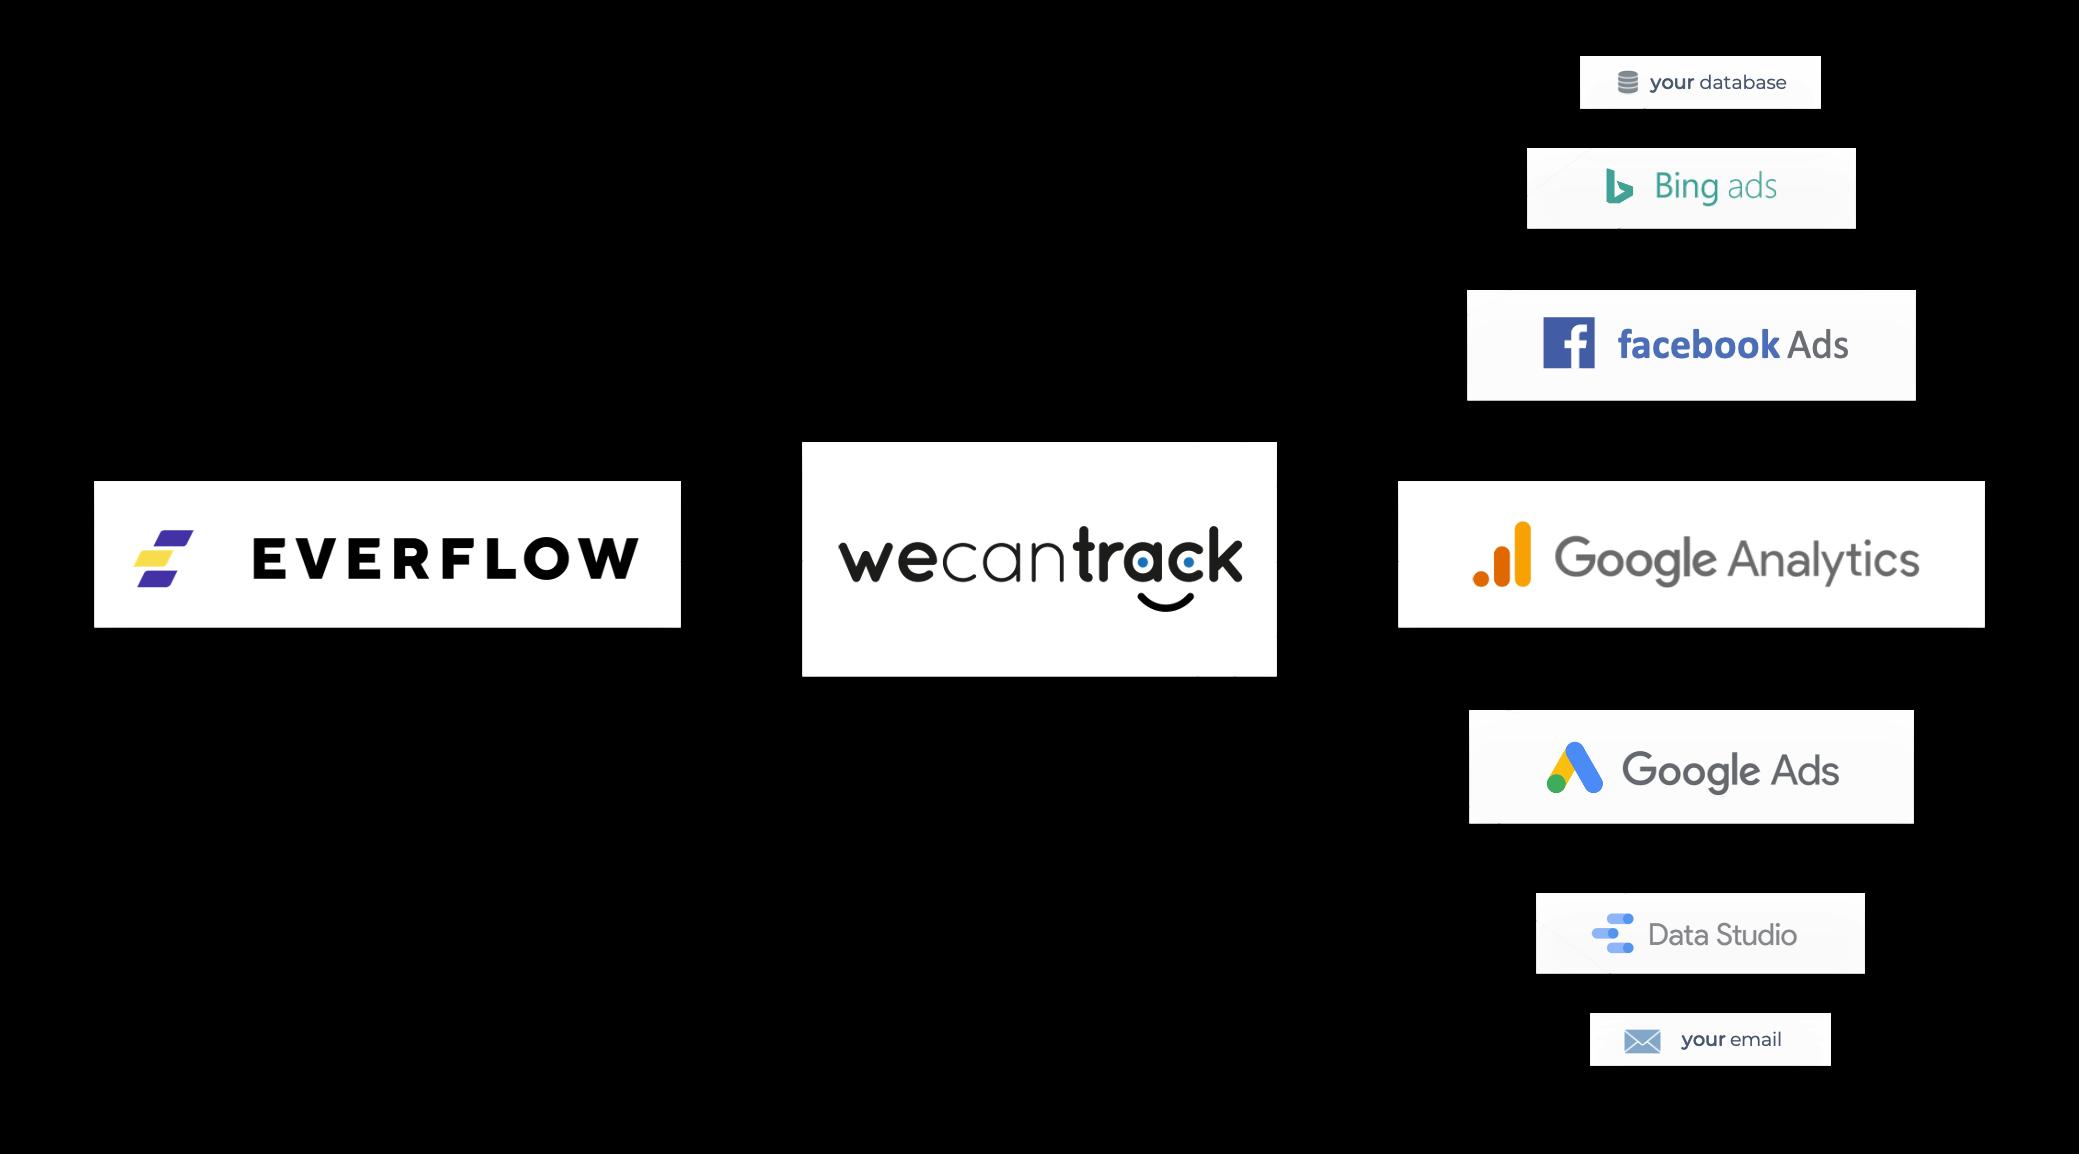 everflow-postback-url-integration